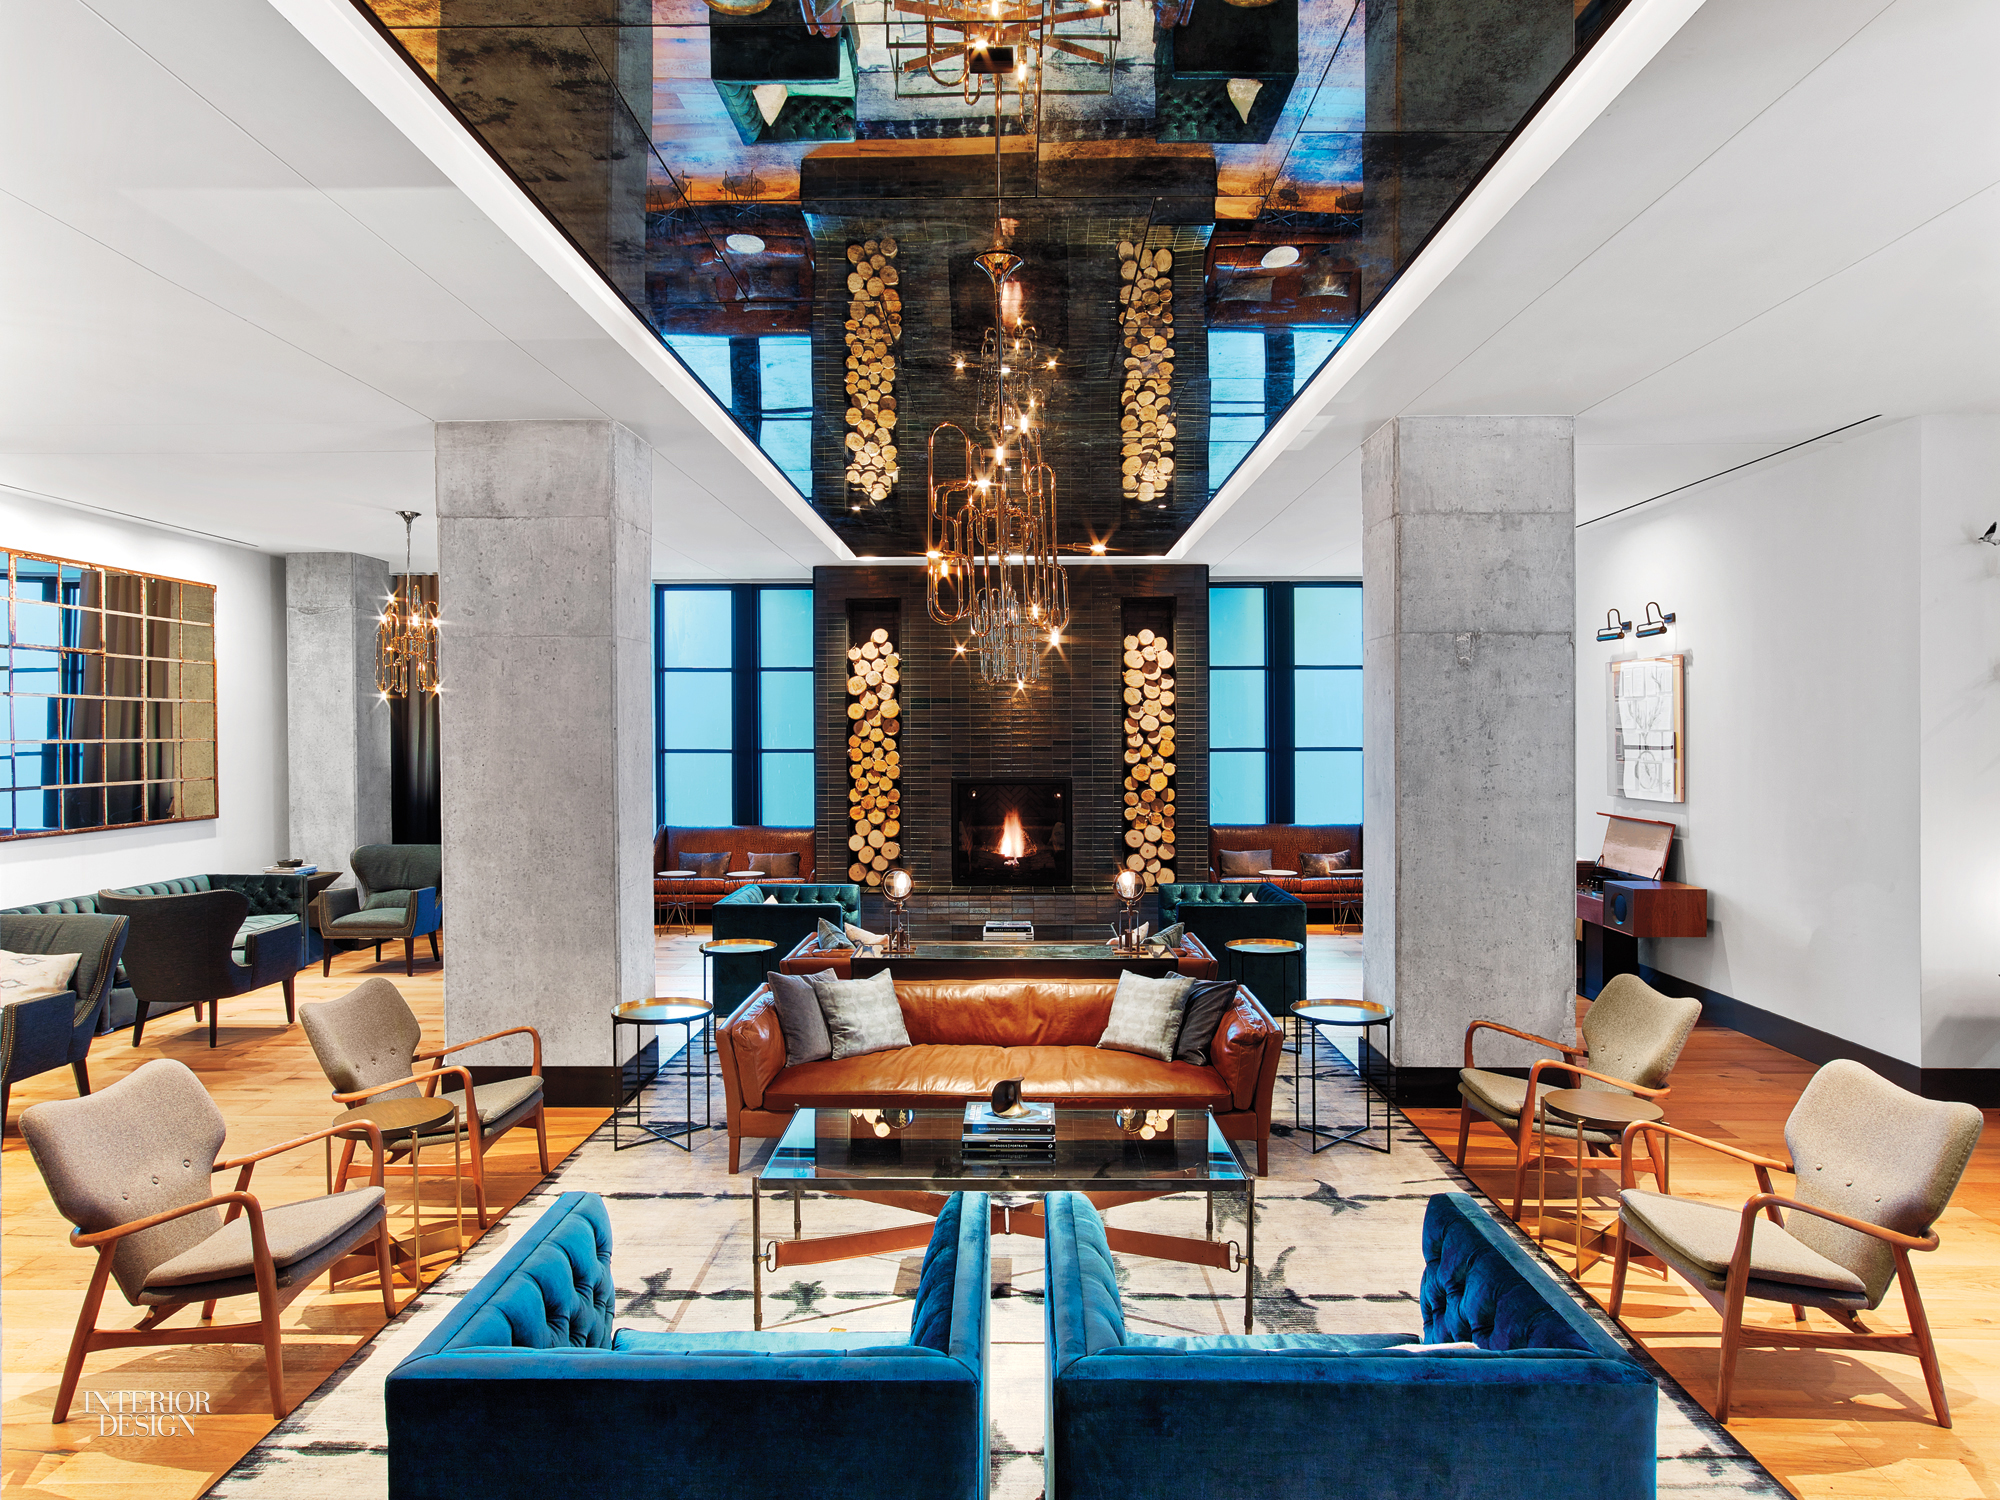 hospitality interior design firms austin www